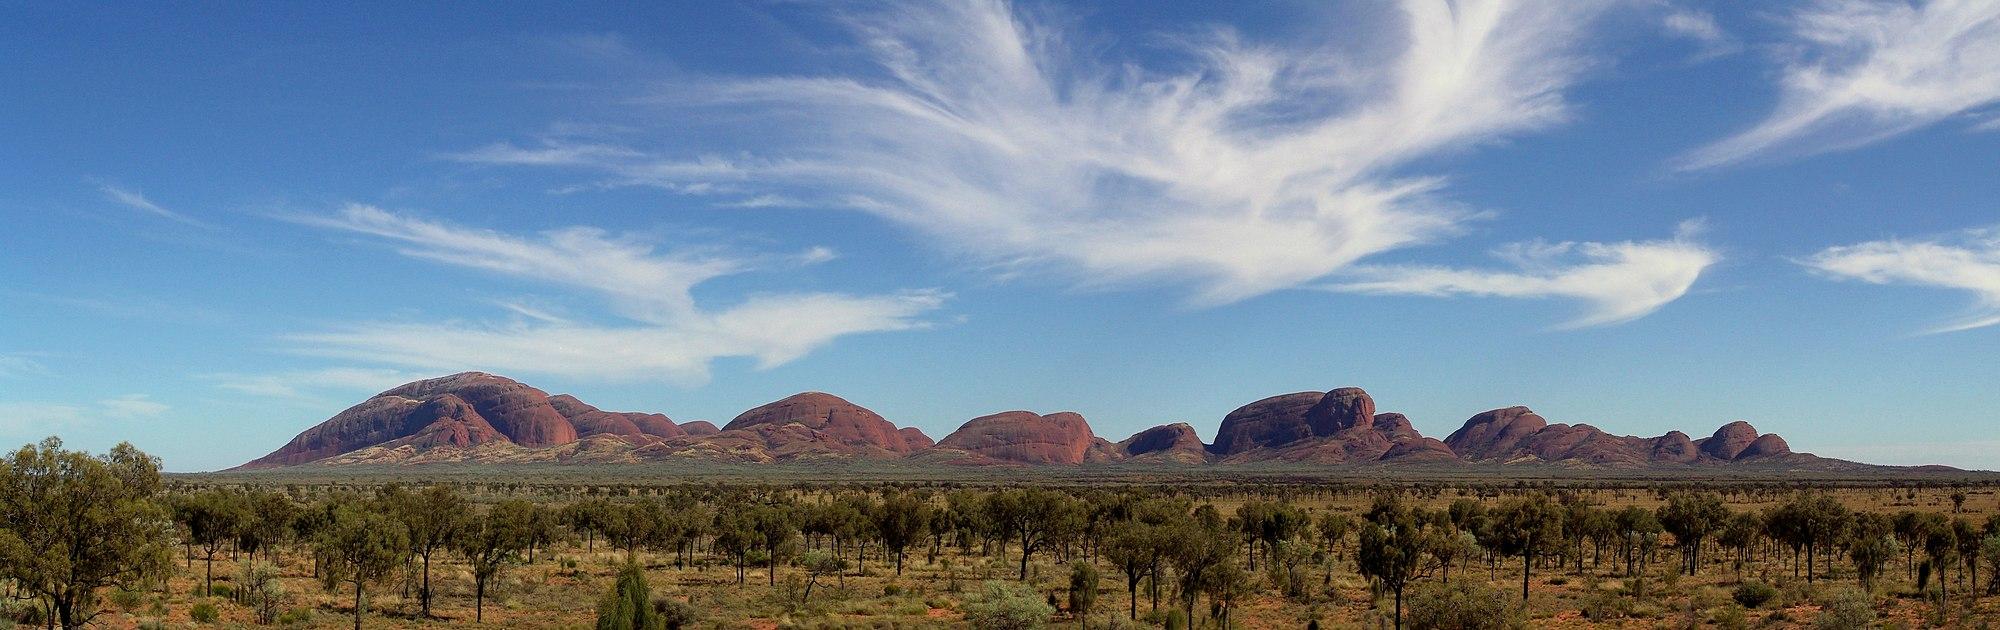 Uluru-Kata Tjuta National Park, Australia  № 891714 загрузить